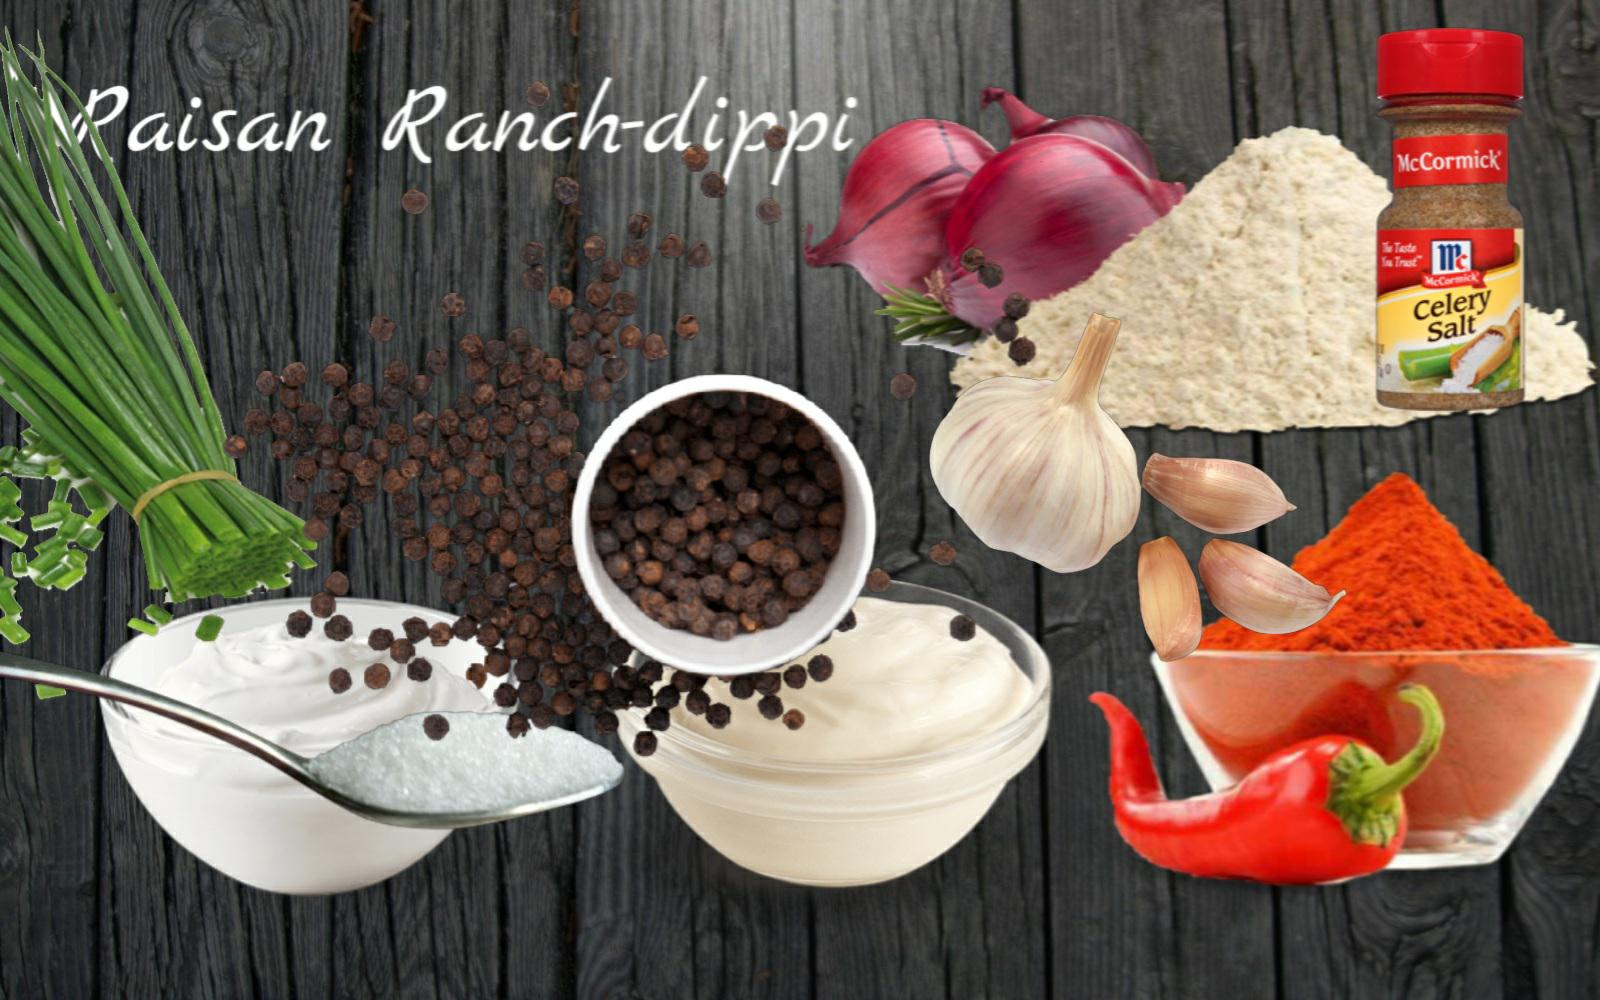 WS Snacks reseptit: Kokeile itse – Raisan Ranch-dippi!